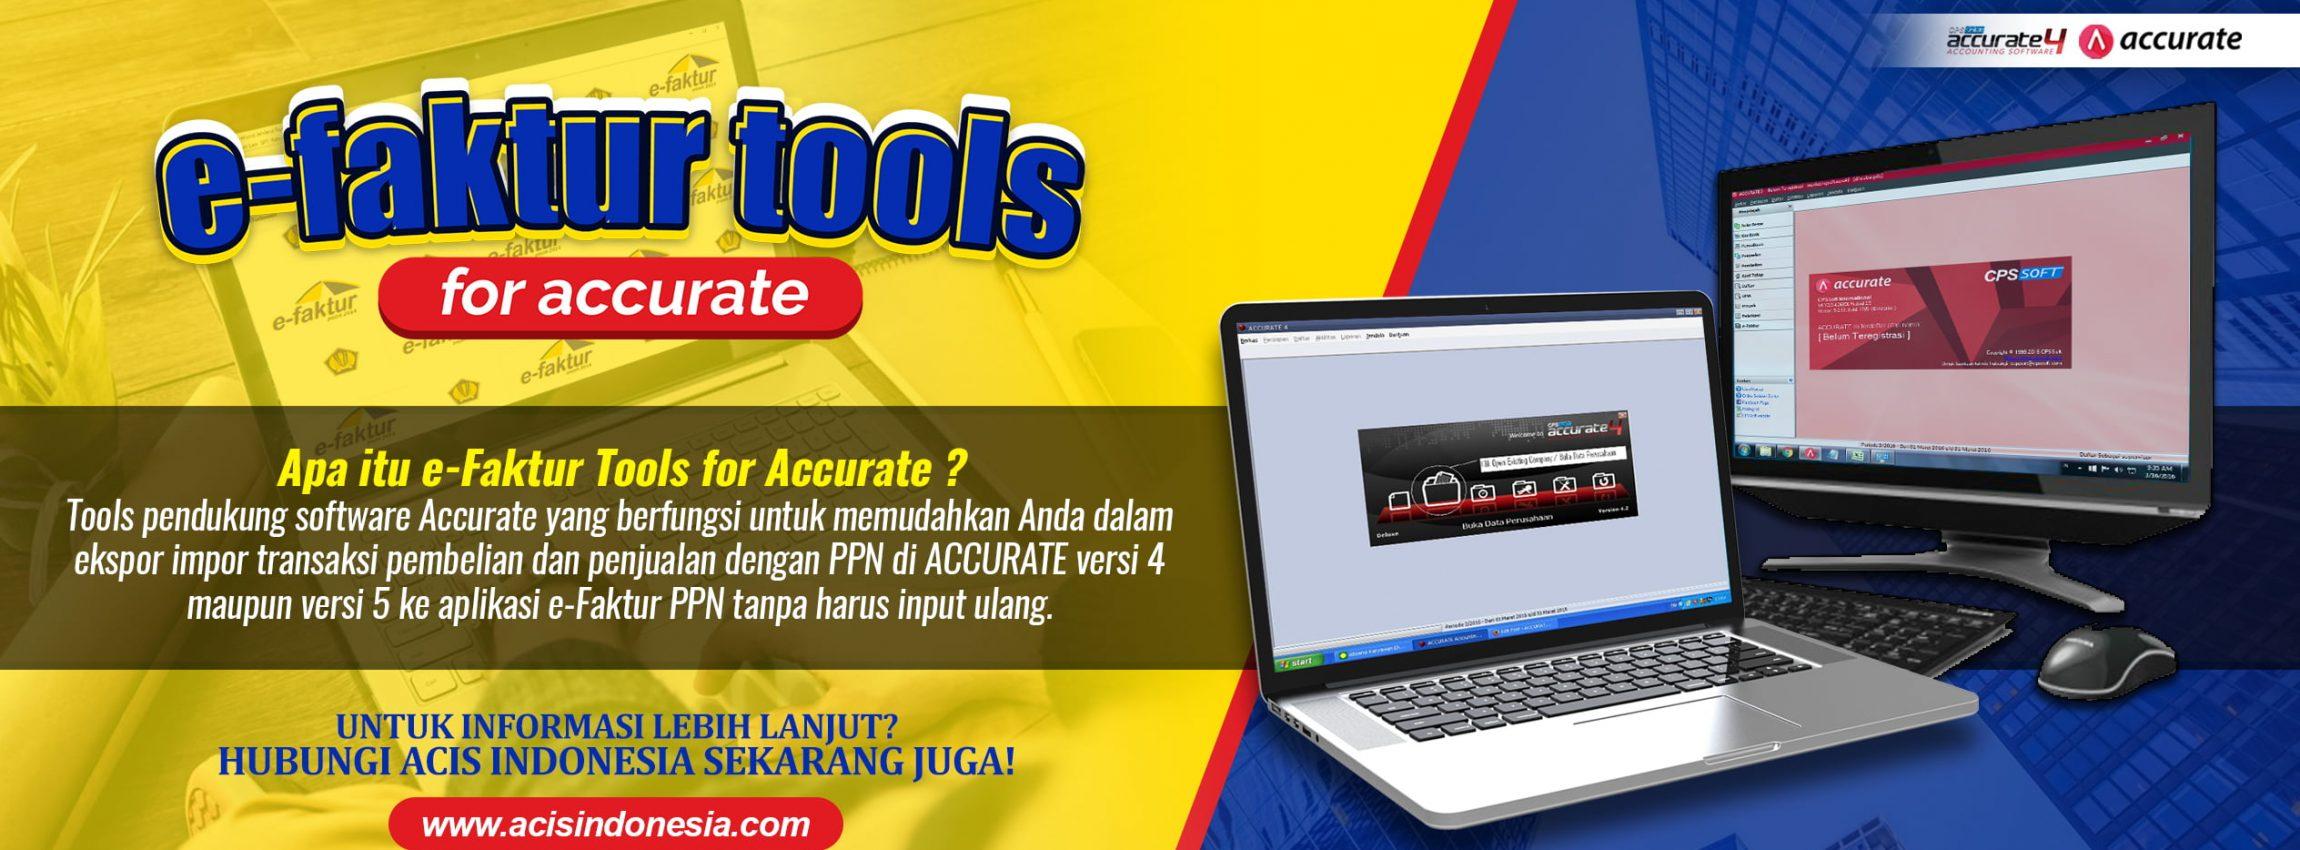 efaktur-tools